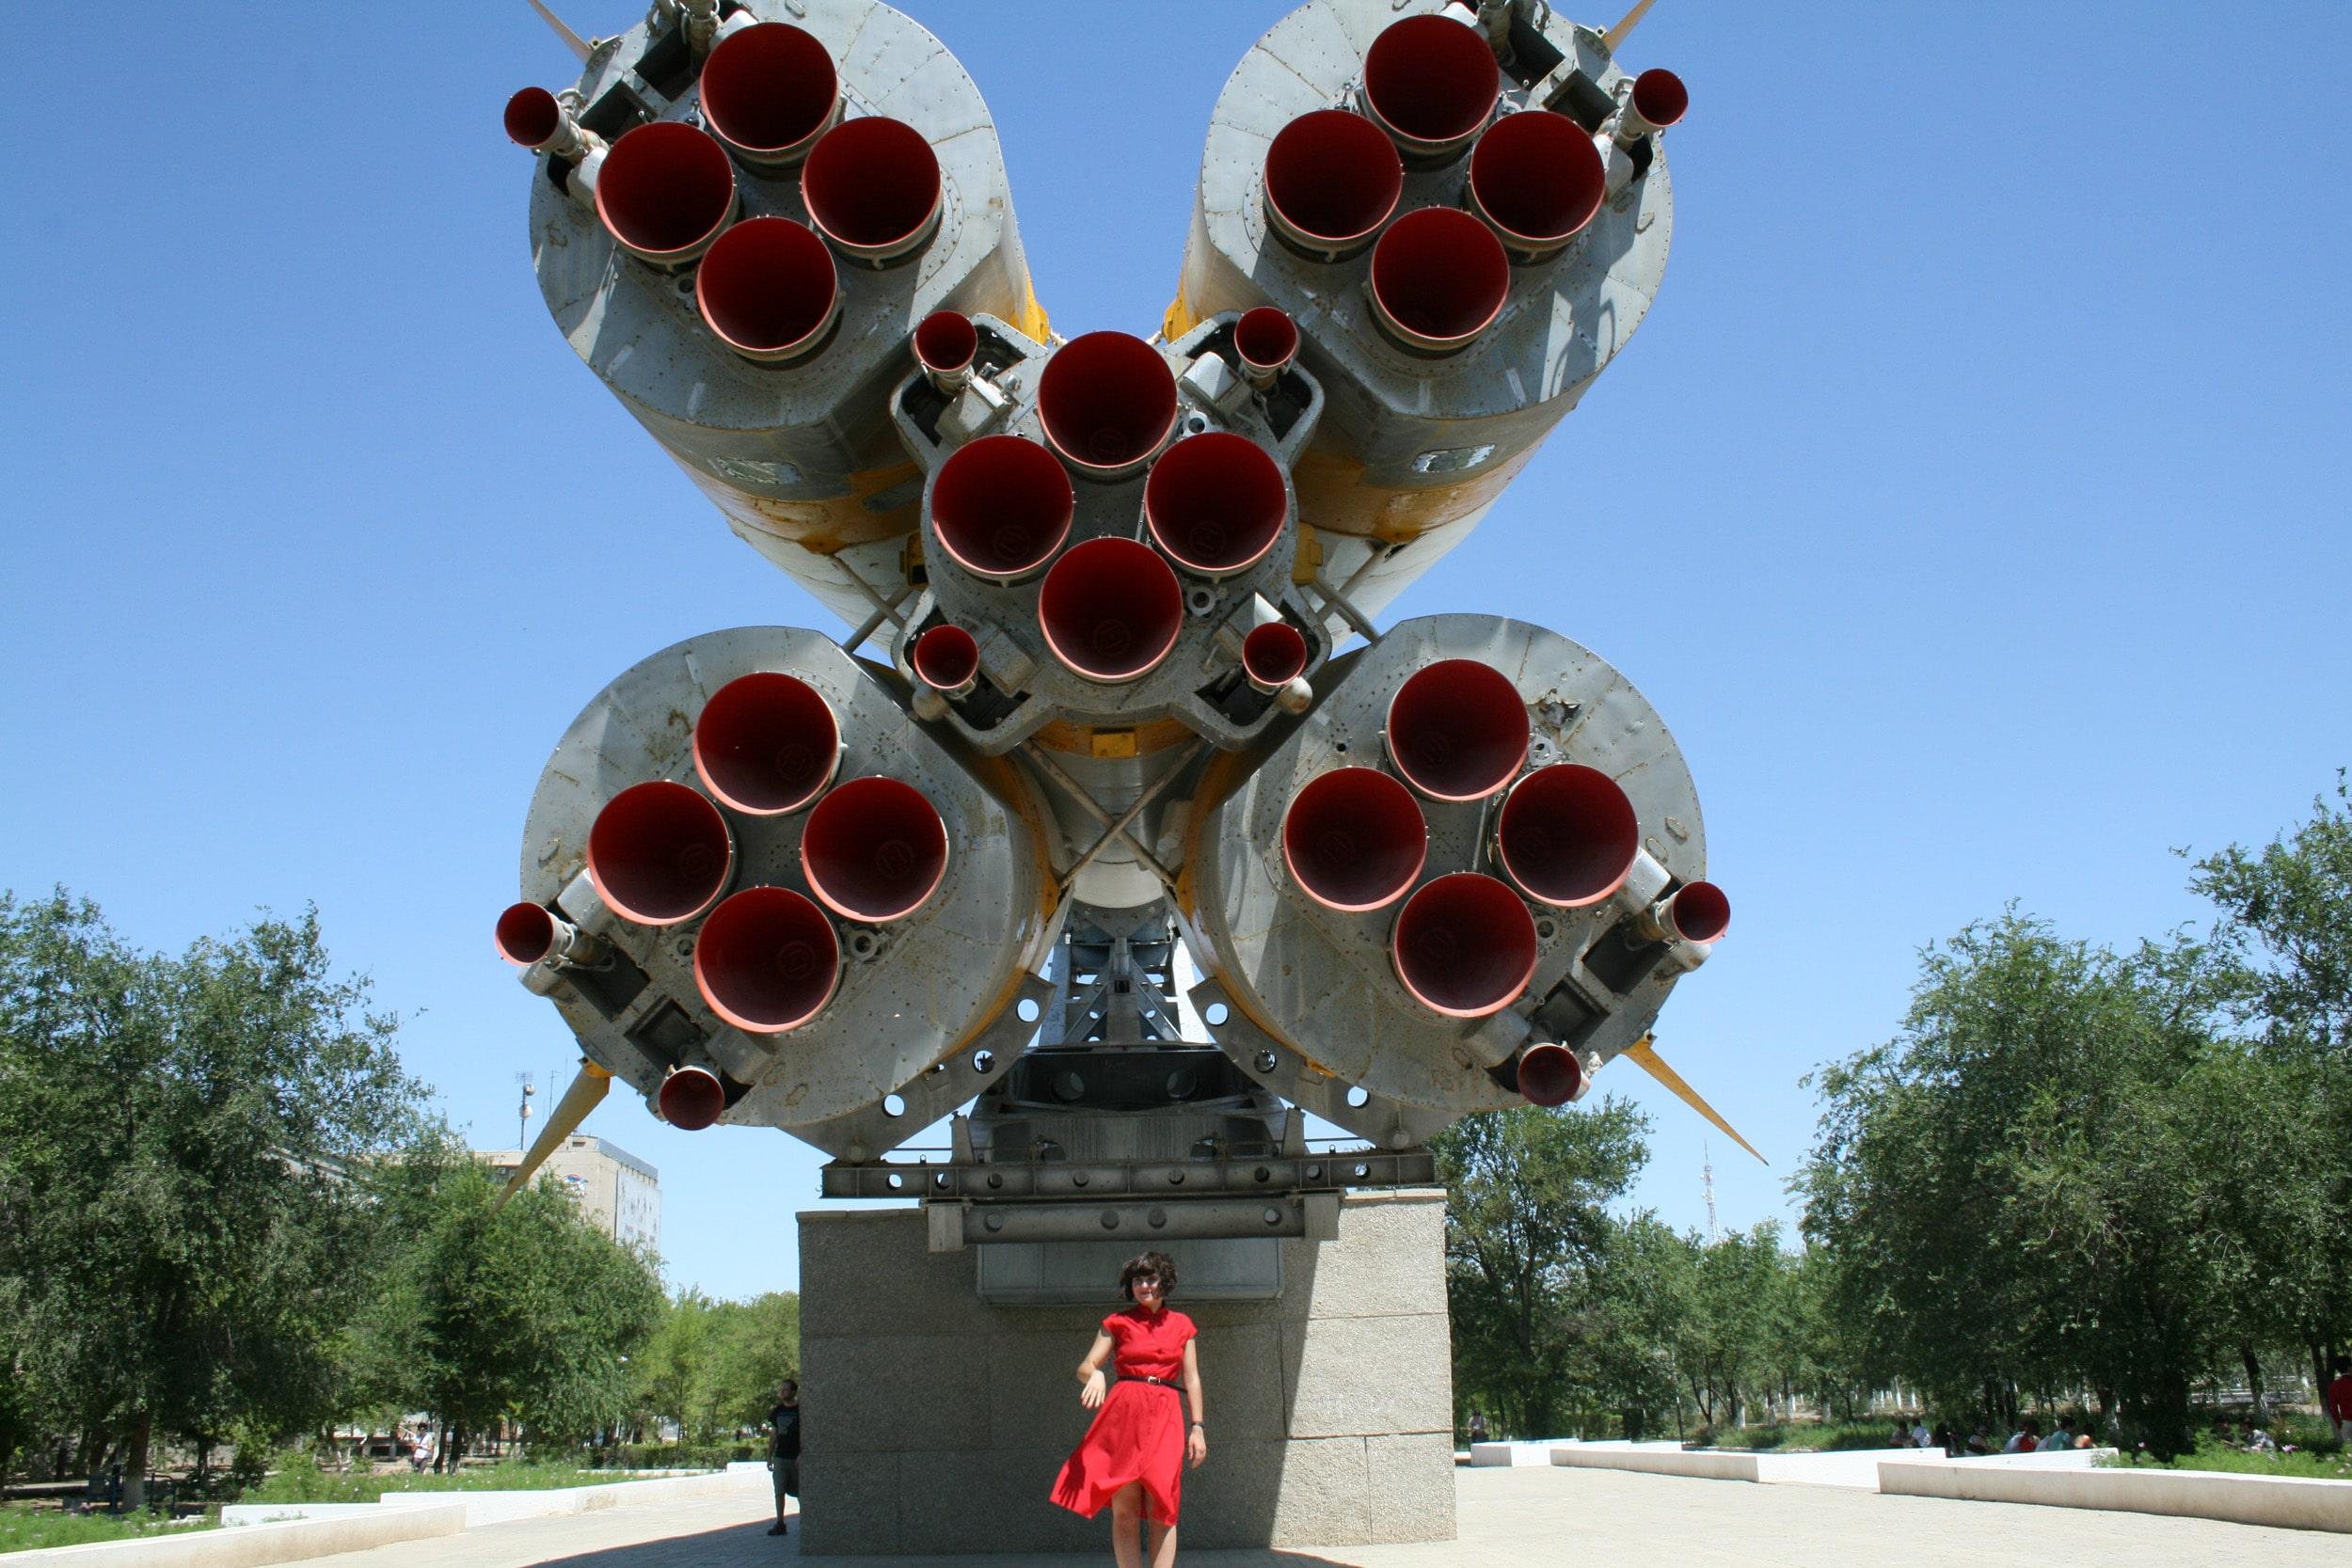 Nelly In front of Soyuz Rocket In baikonur Cosmodrome